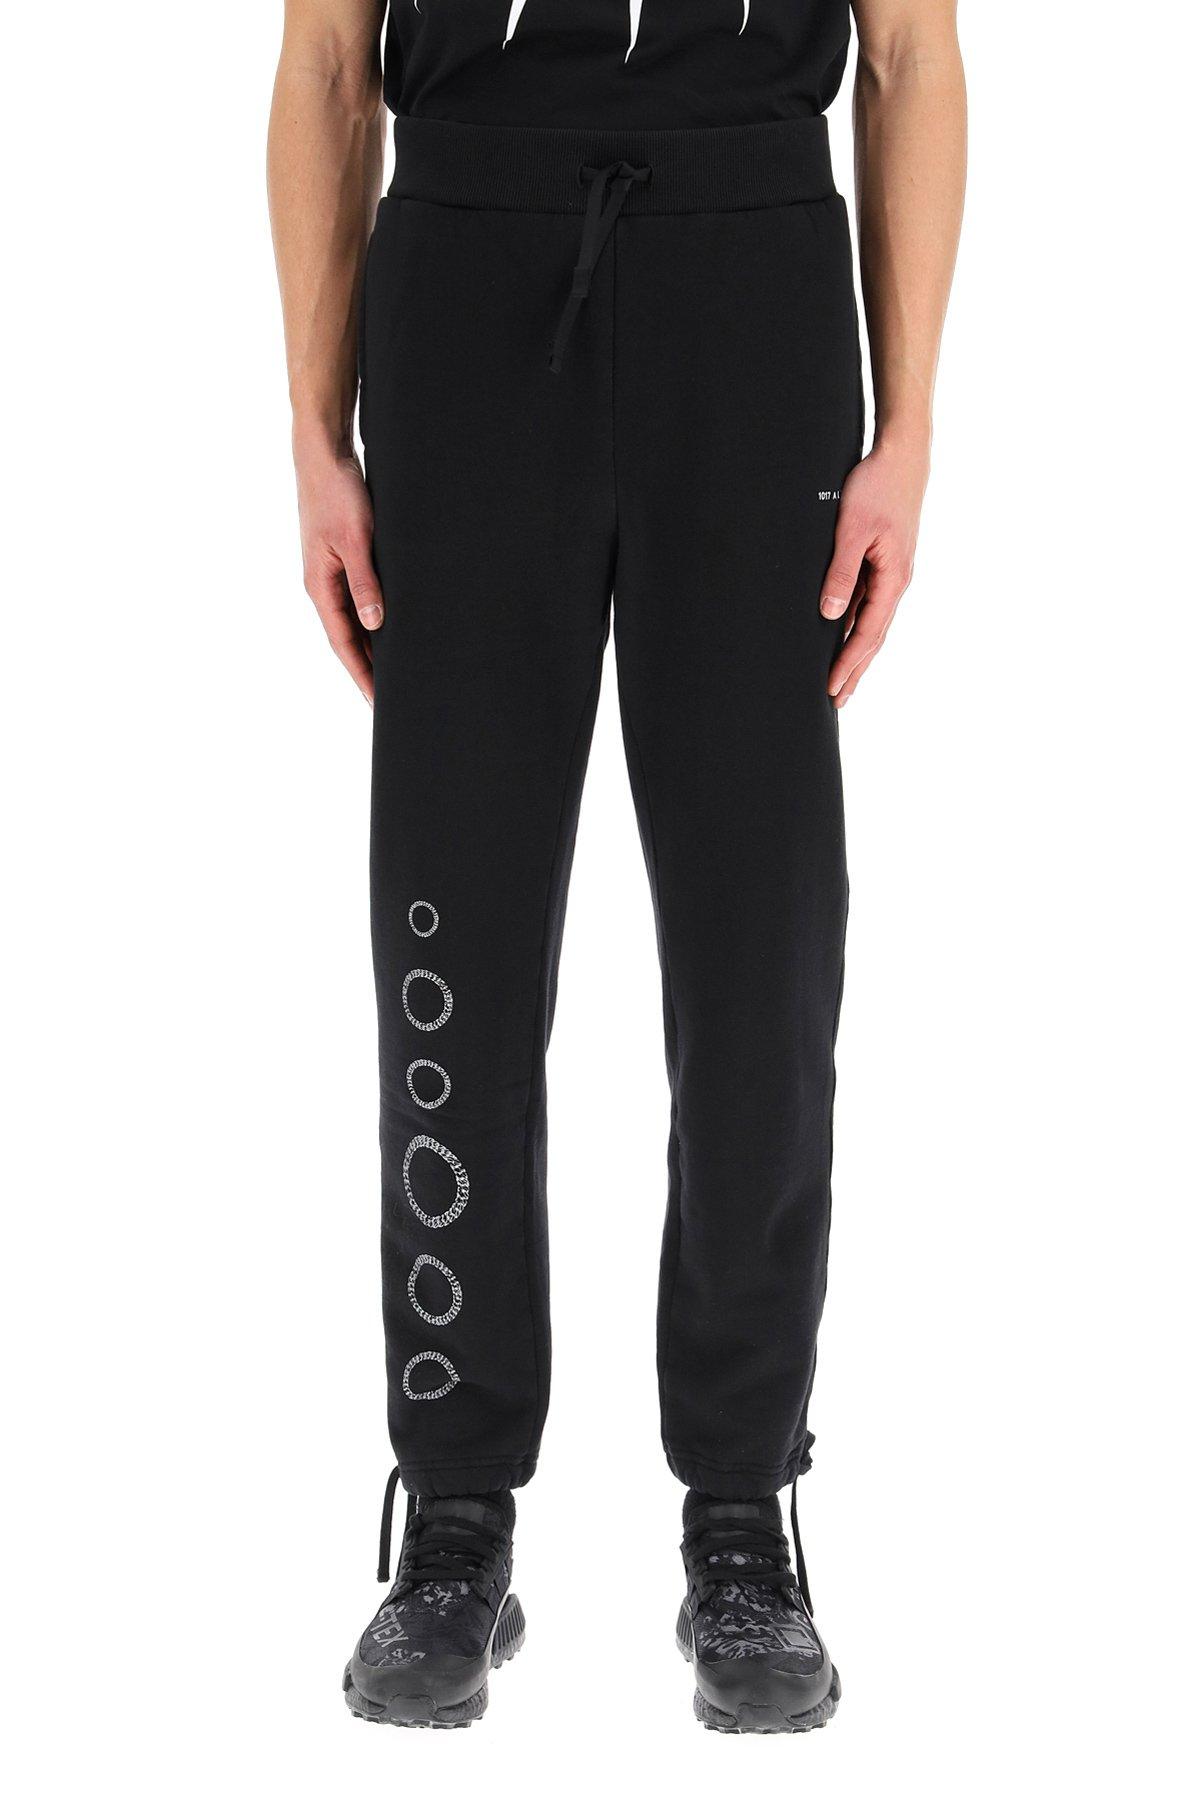 1017 alyx 9sm pantaloni jogger stamap cube chain